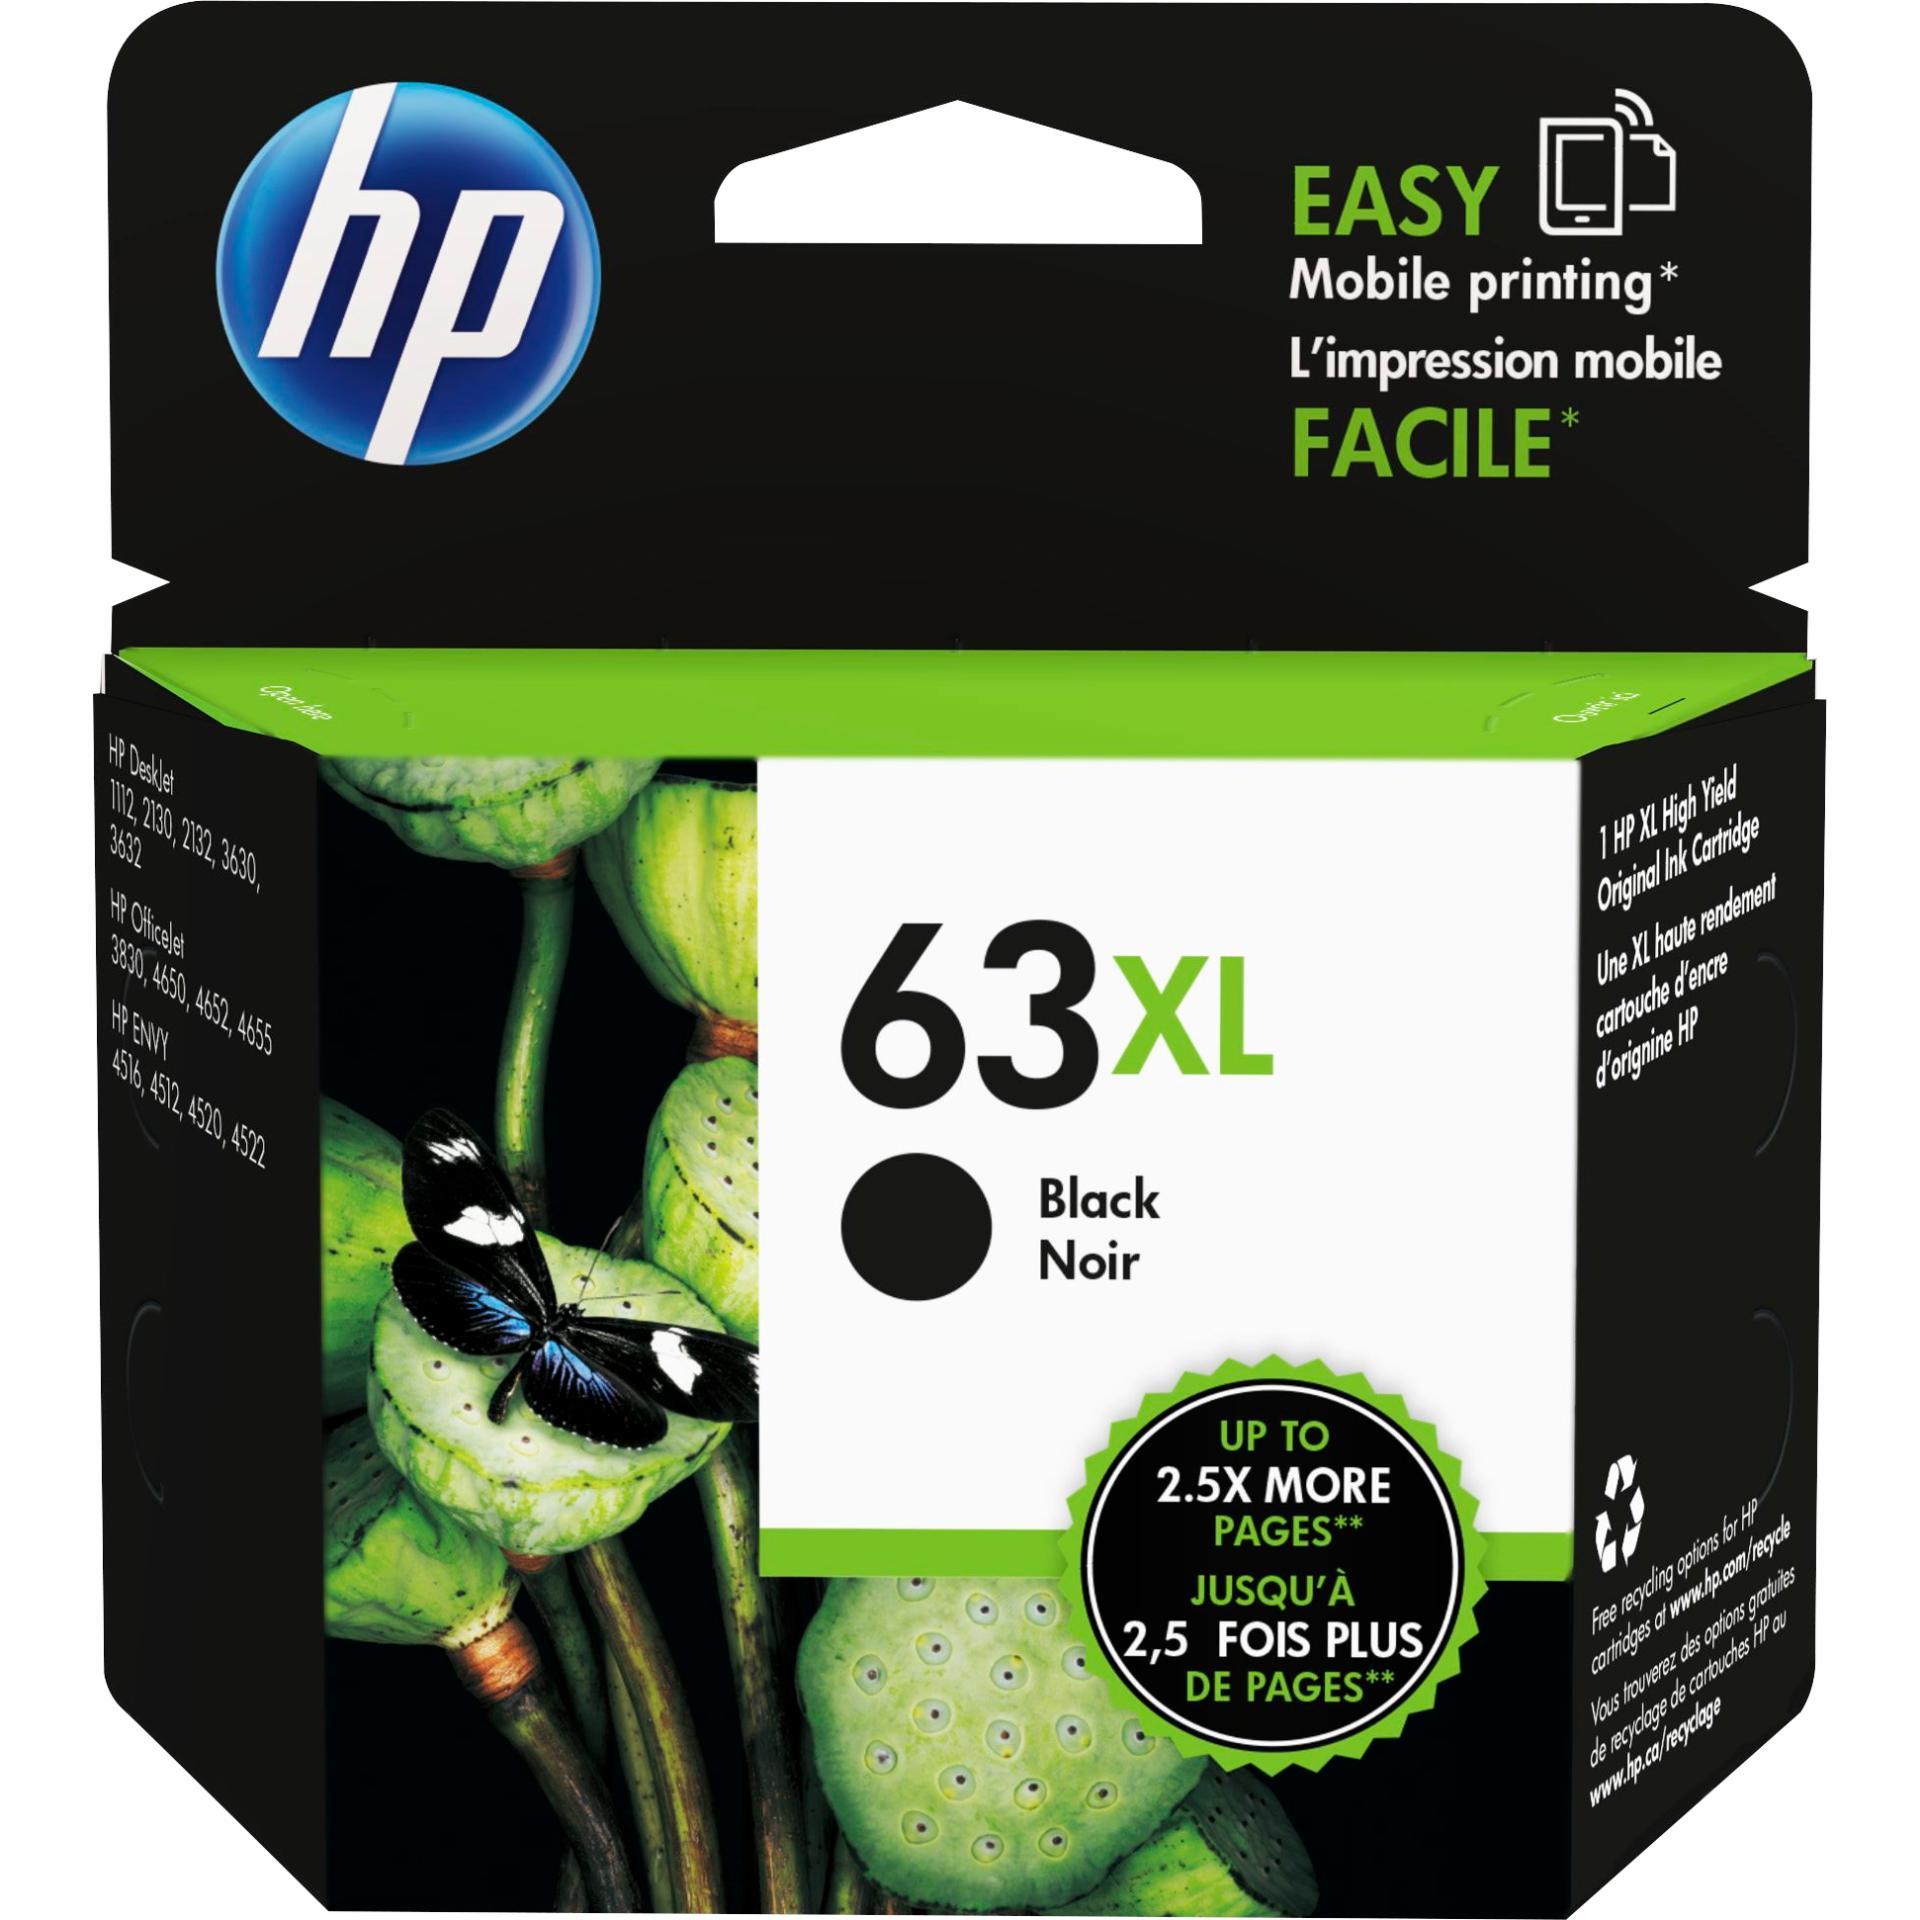 Hp 63xl High Yield Black Original Ink Cartridge Deskjet 1100/1111/1113/1114/2130/2131/2133/2134/2136/2137/3630; Envy 4510/4513/4520; Officejet 3830/4650/4655/5220/5230/5252/5255/5258/5260/5264 By Hp Official Store